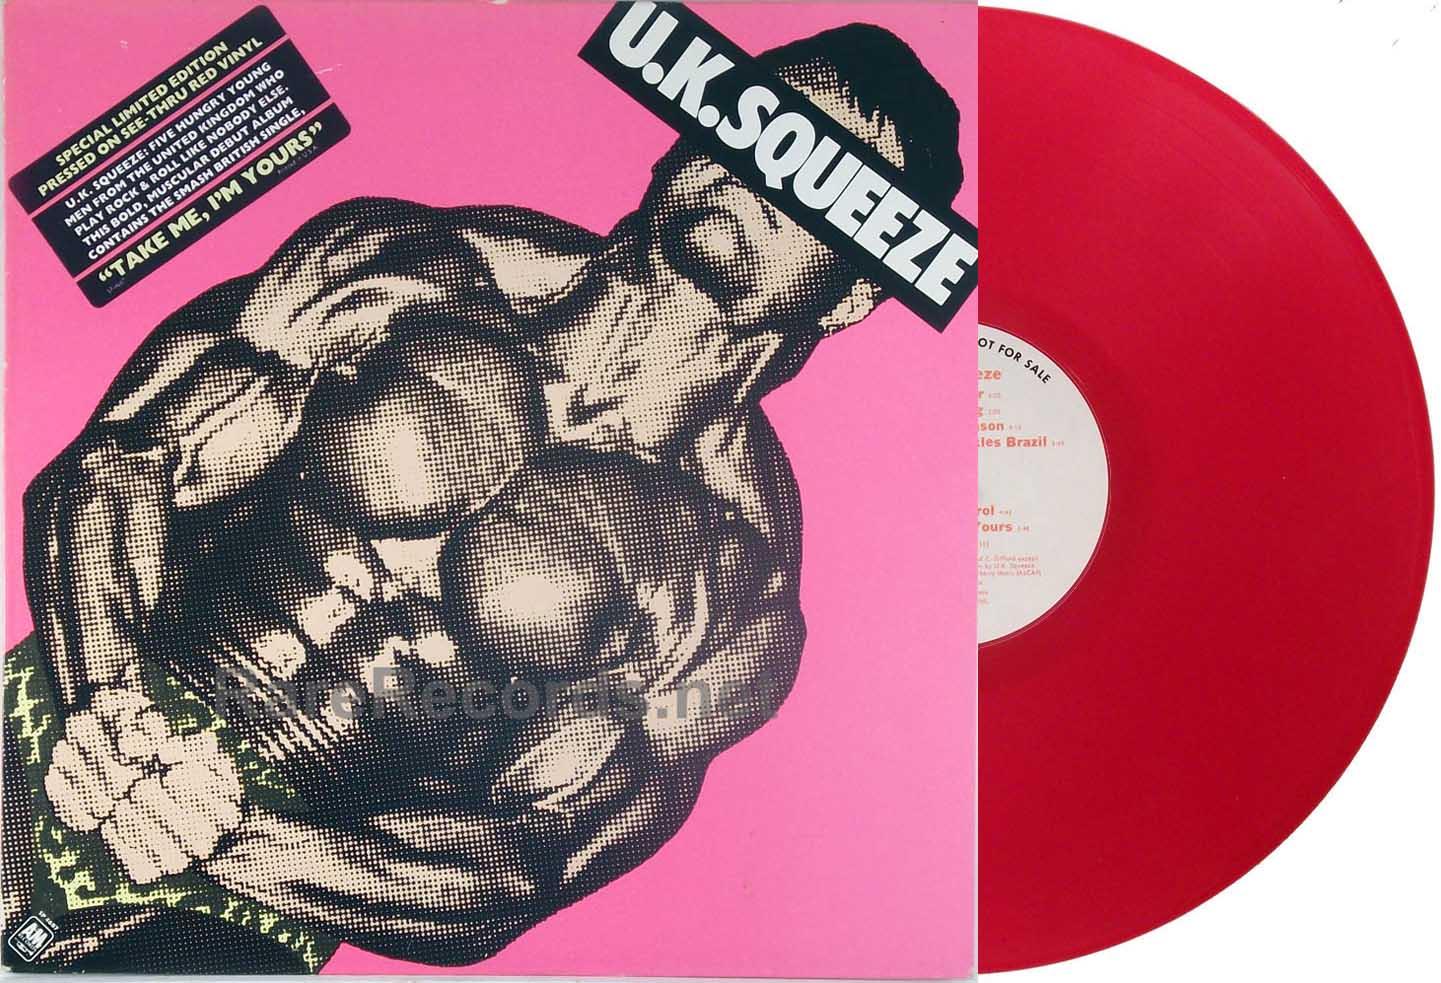 Squeeze - UK Squeeze - red vinyl white label promo LP